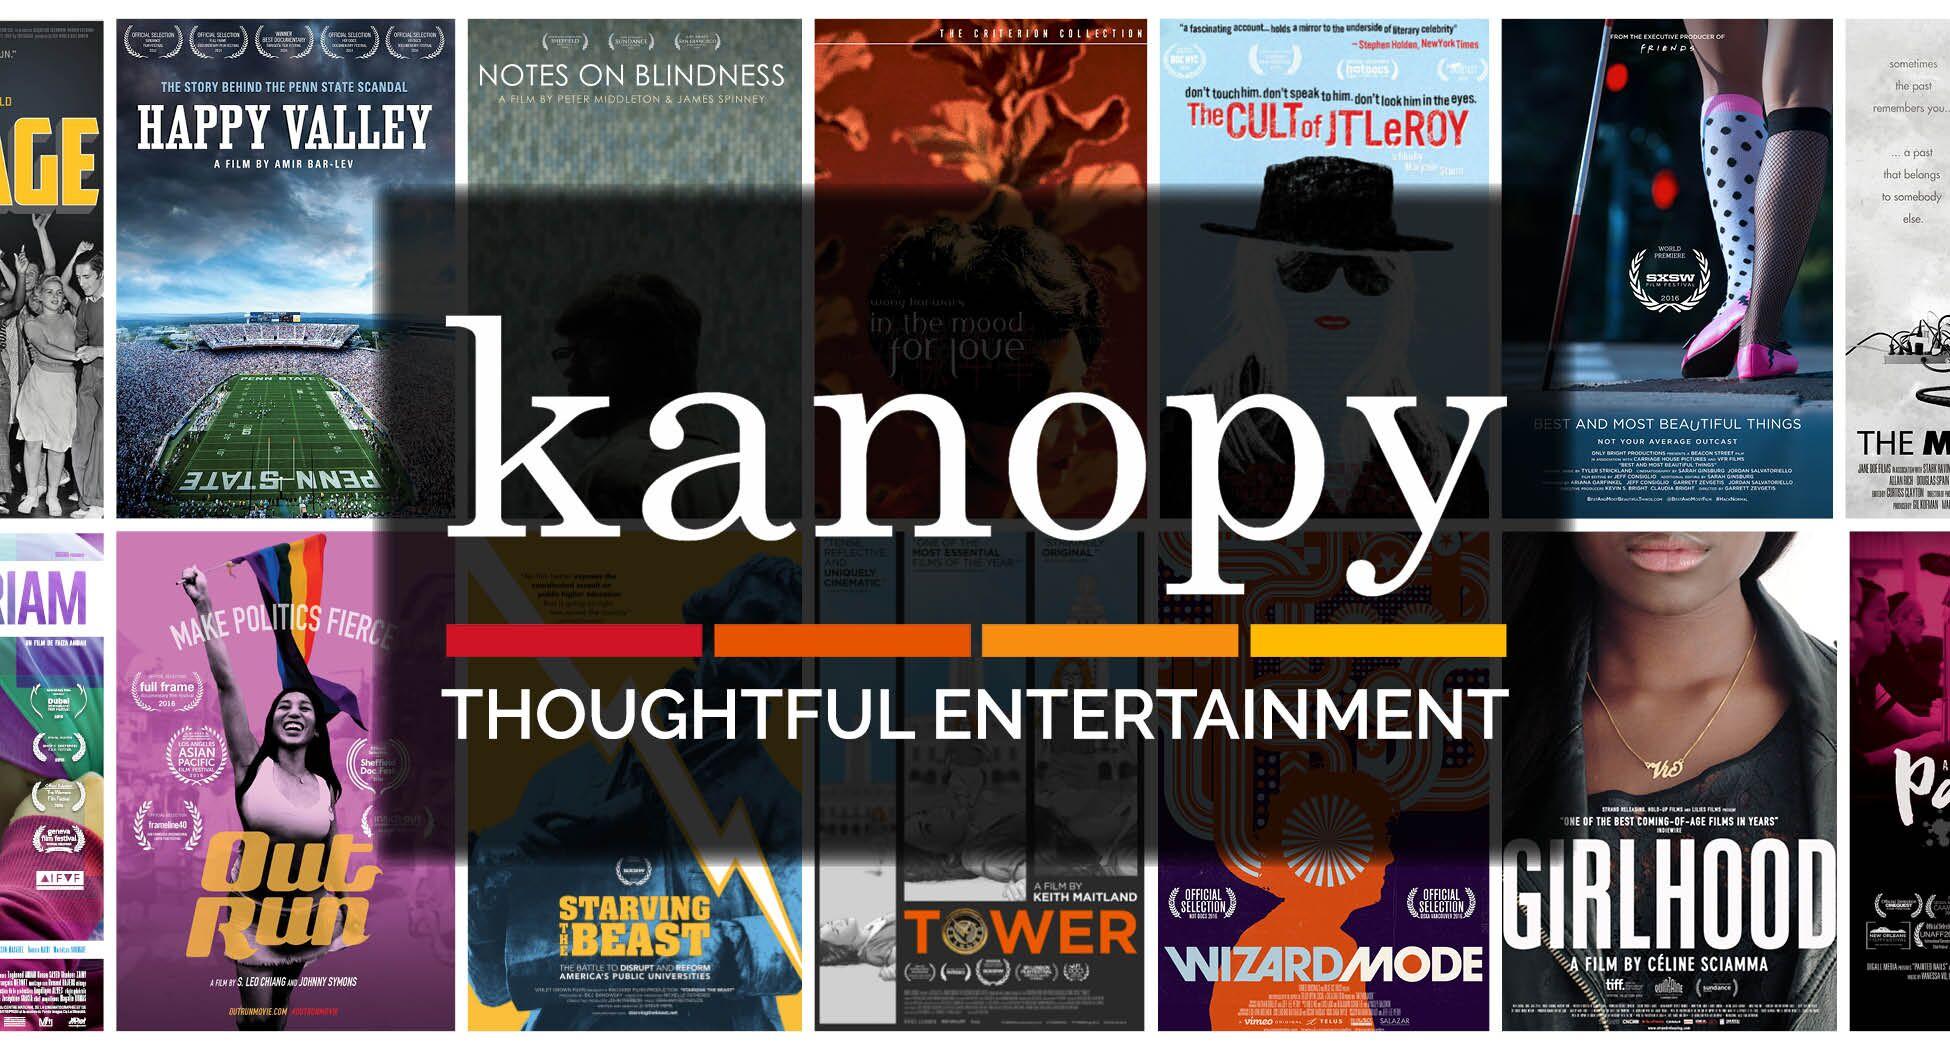 kanopy movies, documentaries and children's videos